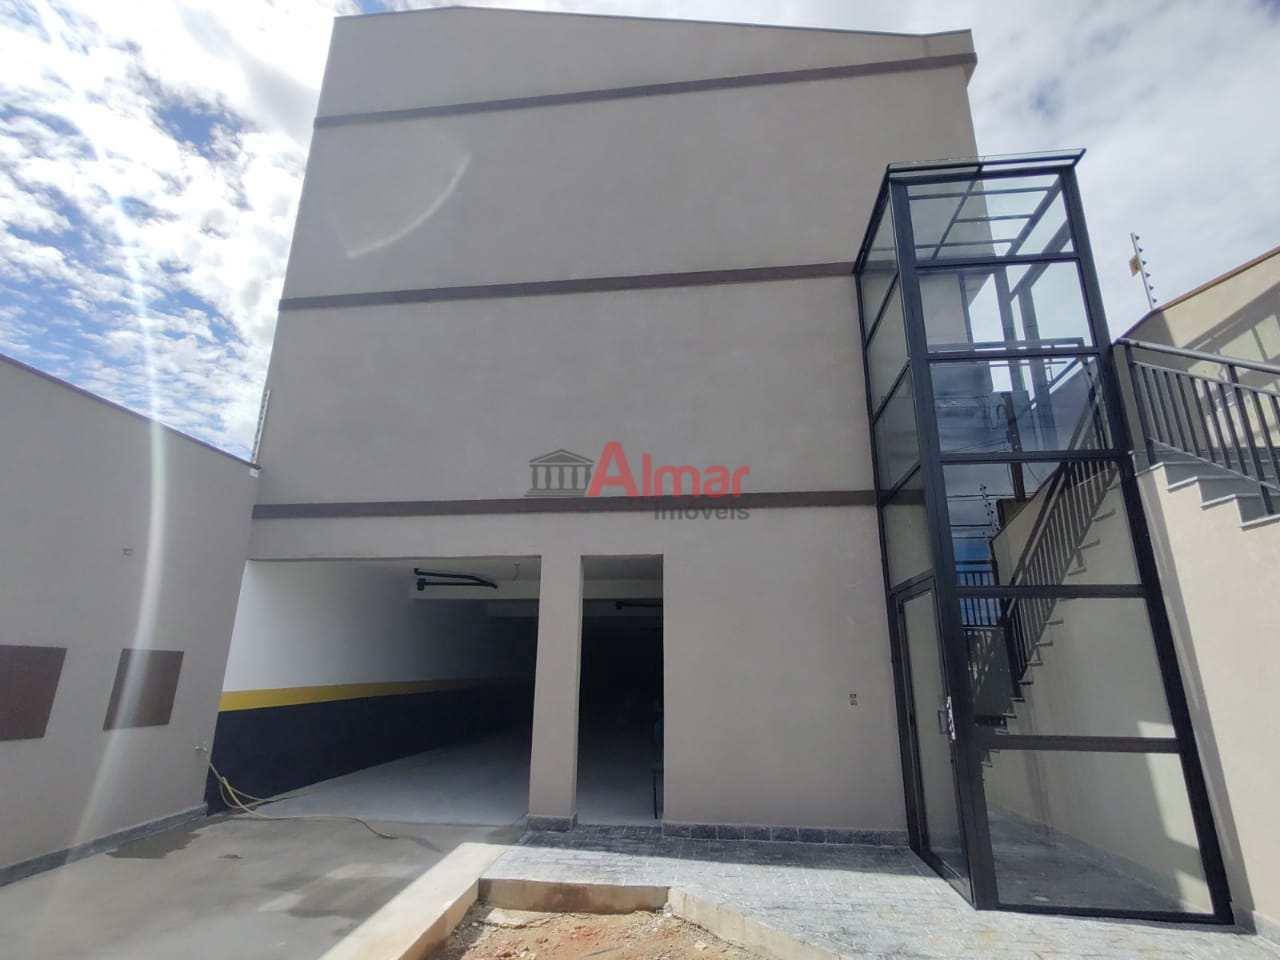 Condomínio em São Paulo  Bairro Itaquera  - ref.: 209